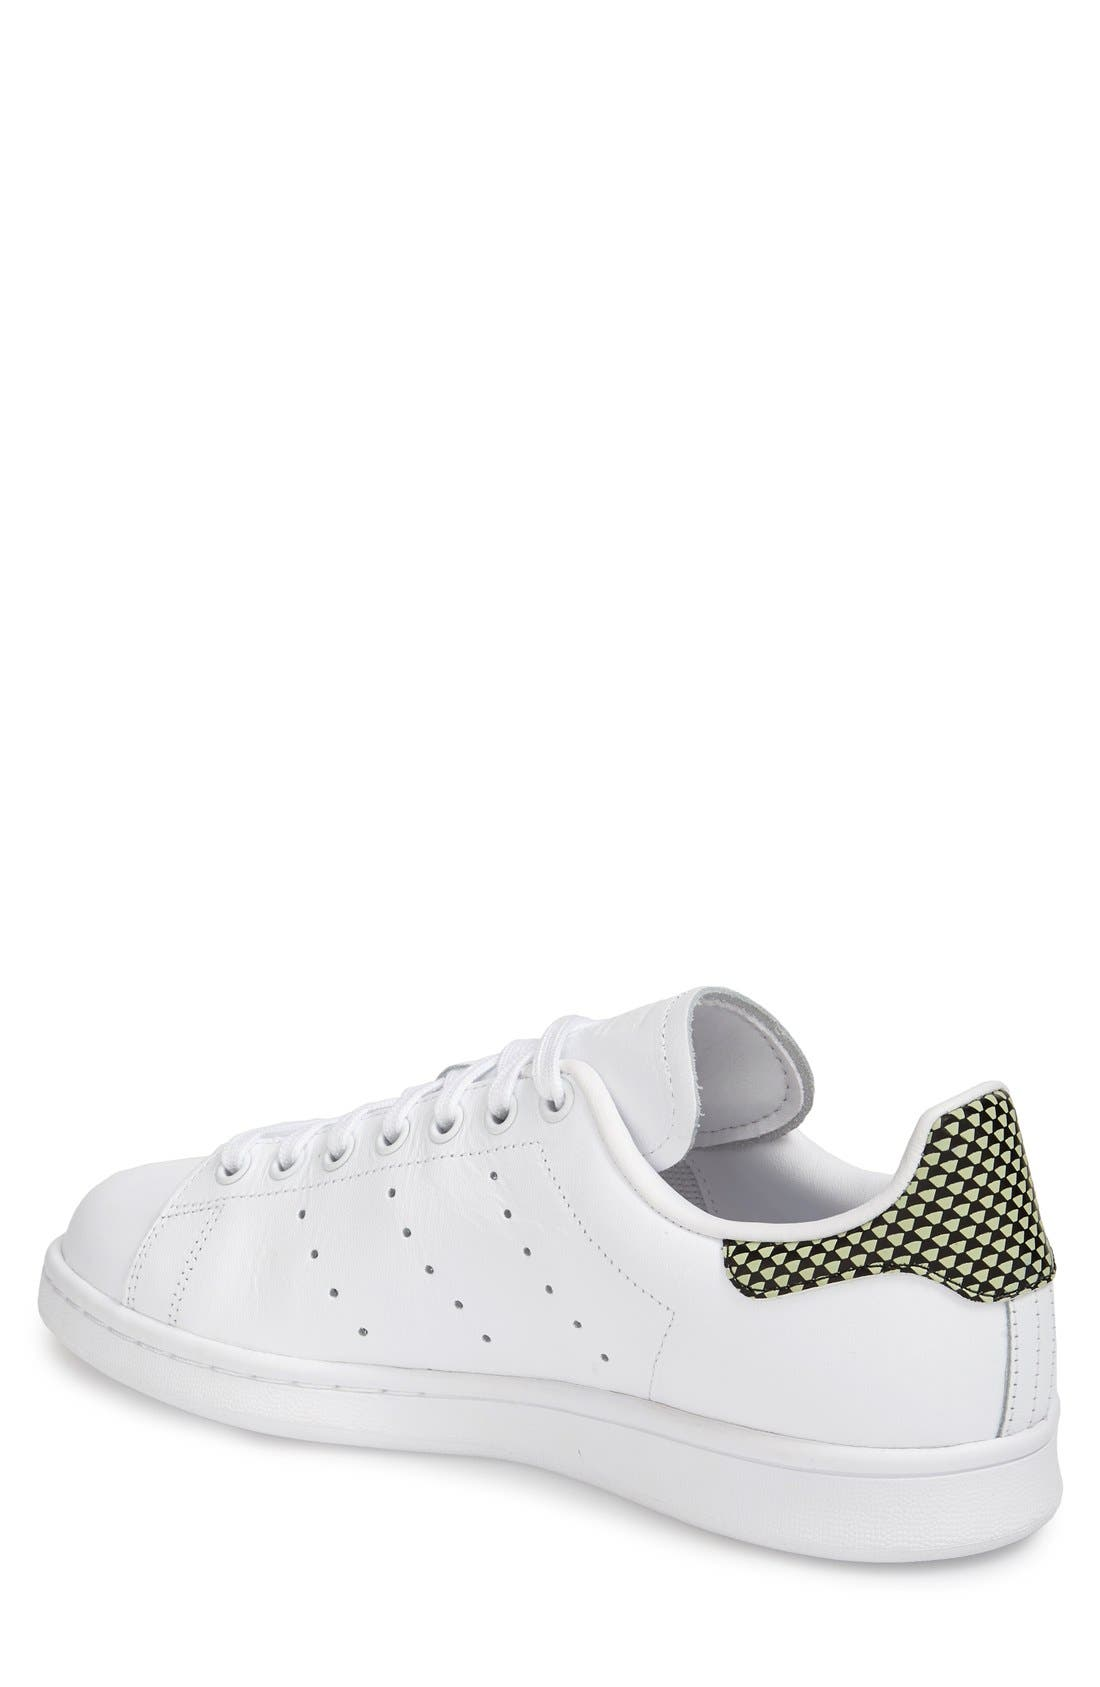 'Stan Smith' Sneaker,                             Alternate thumbnail 101, color,